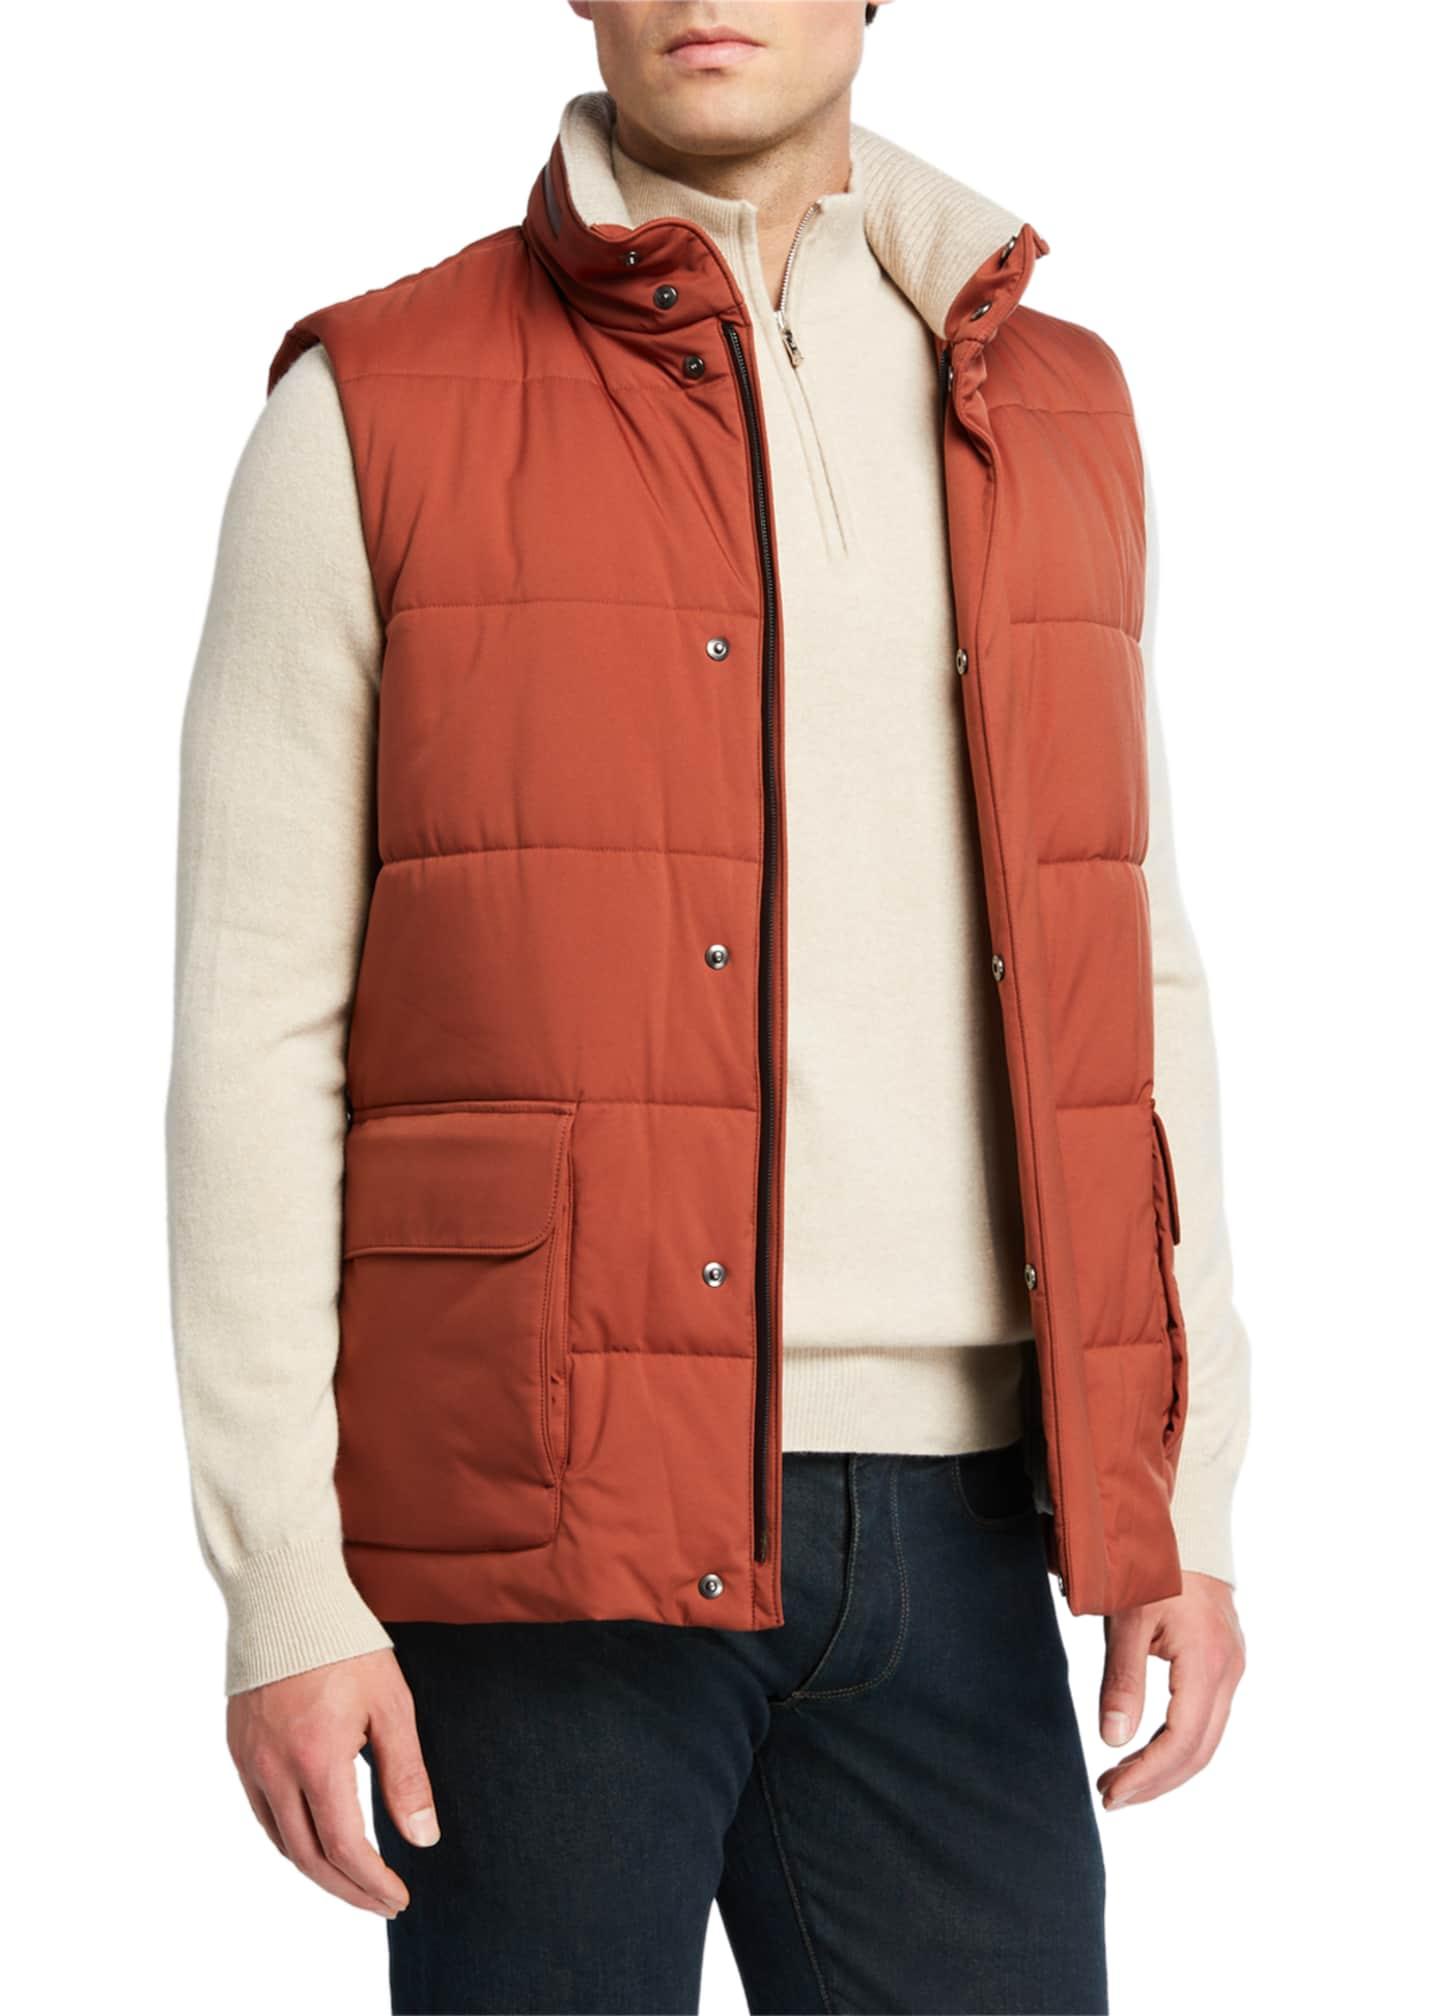 Loro Piana Men's Quilted Winter Voyager Vest